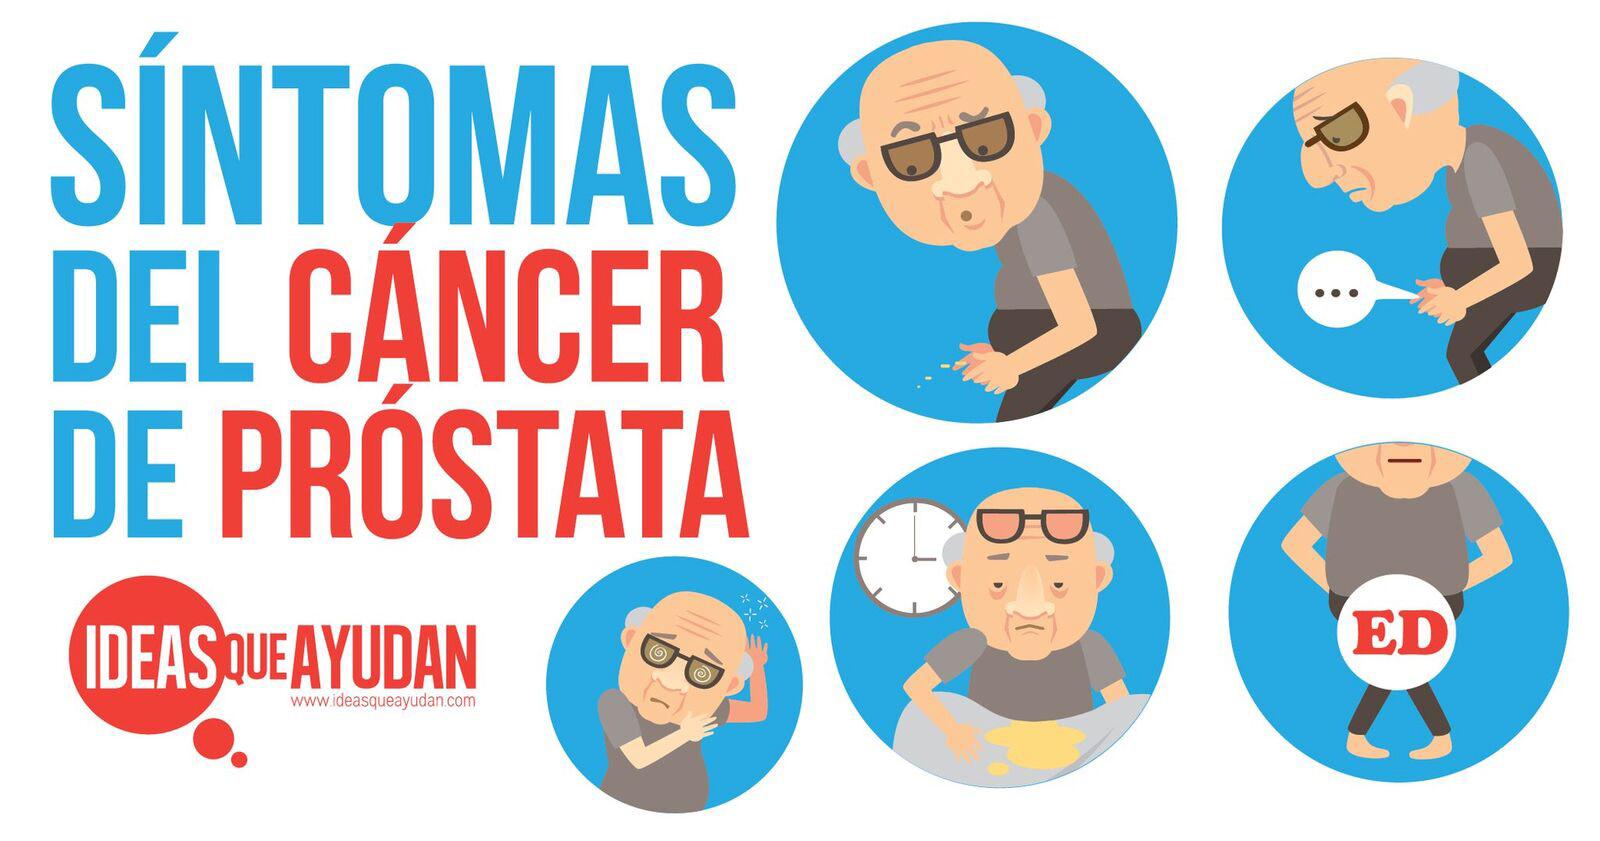 cancer de prostata que es sintomas cancer genetic lung